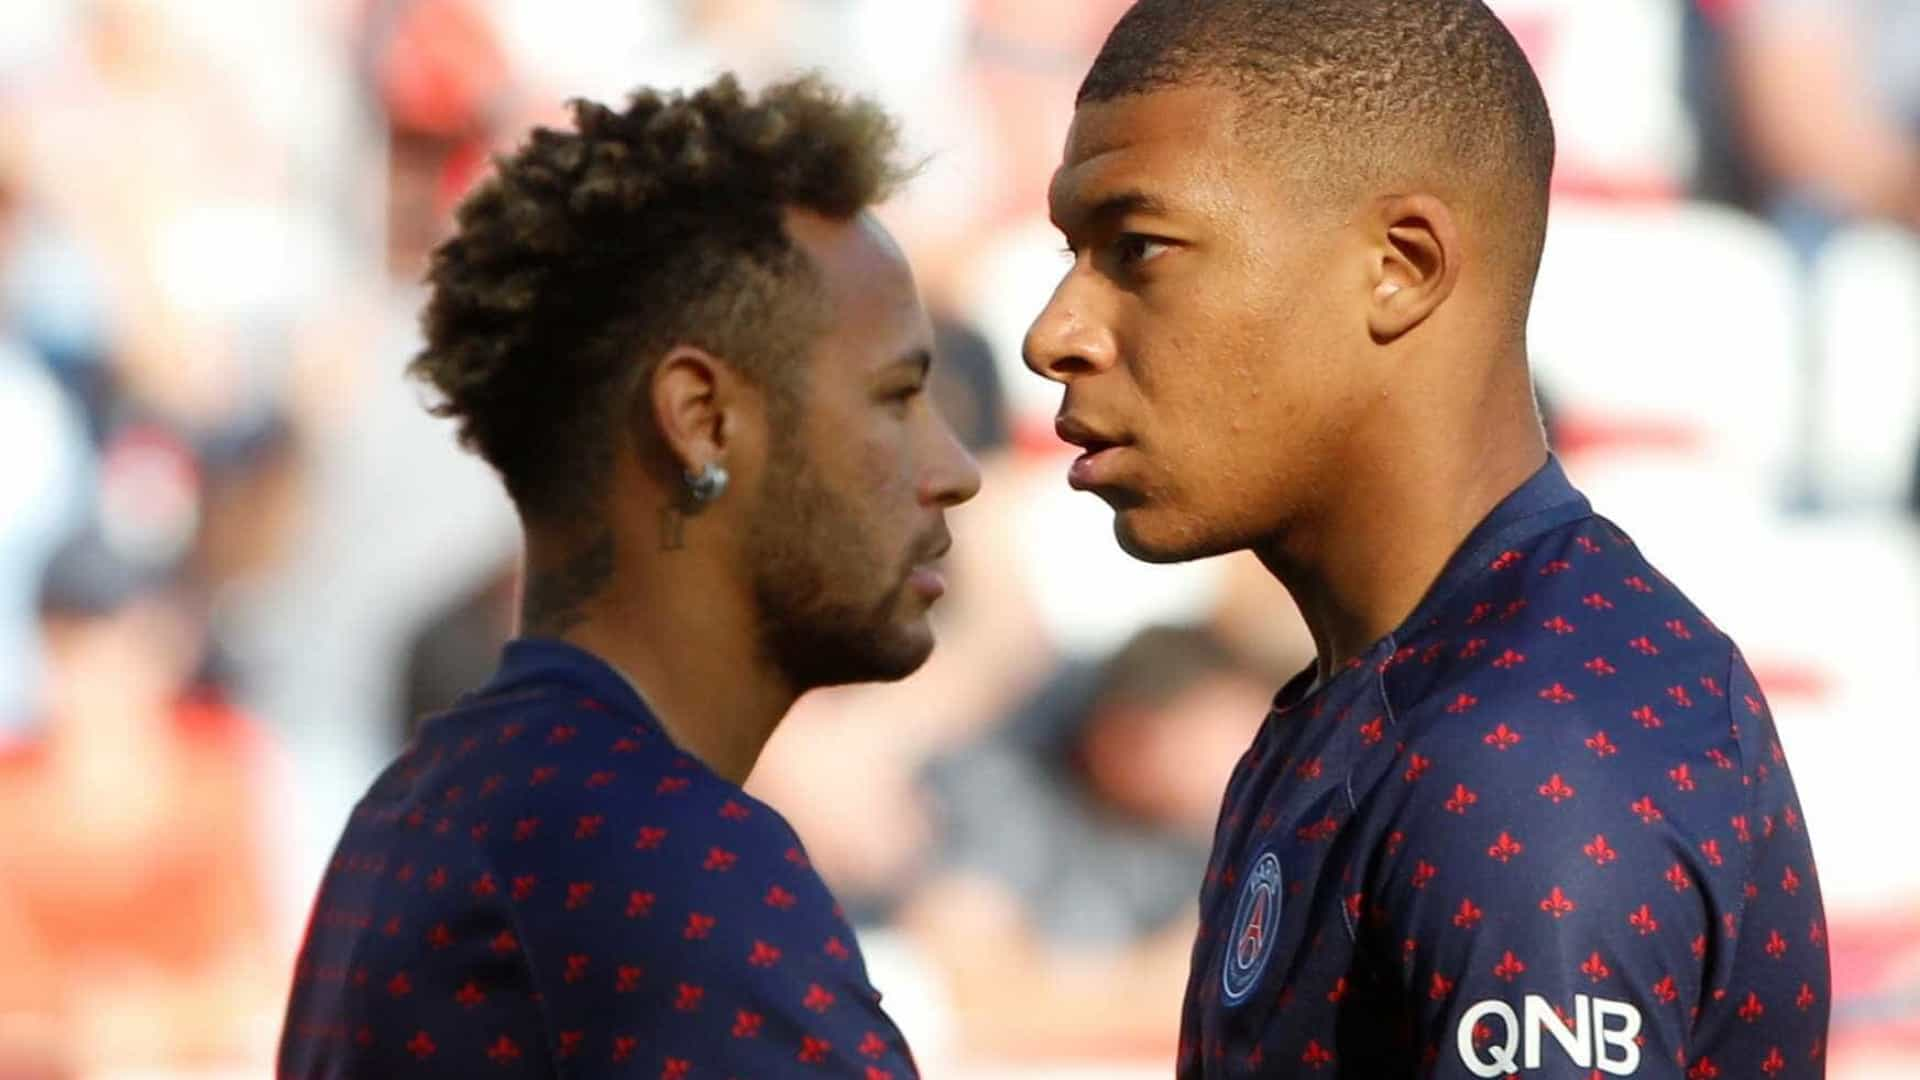 Técnico do PSG admite chance de saída de Neymar e Mbappé